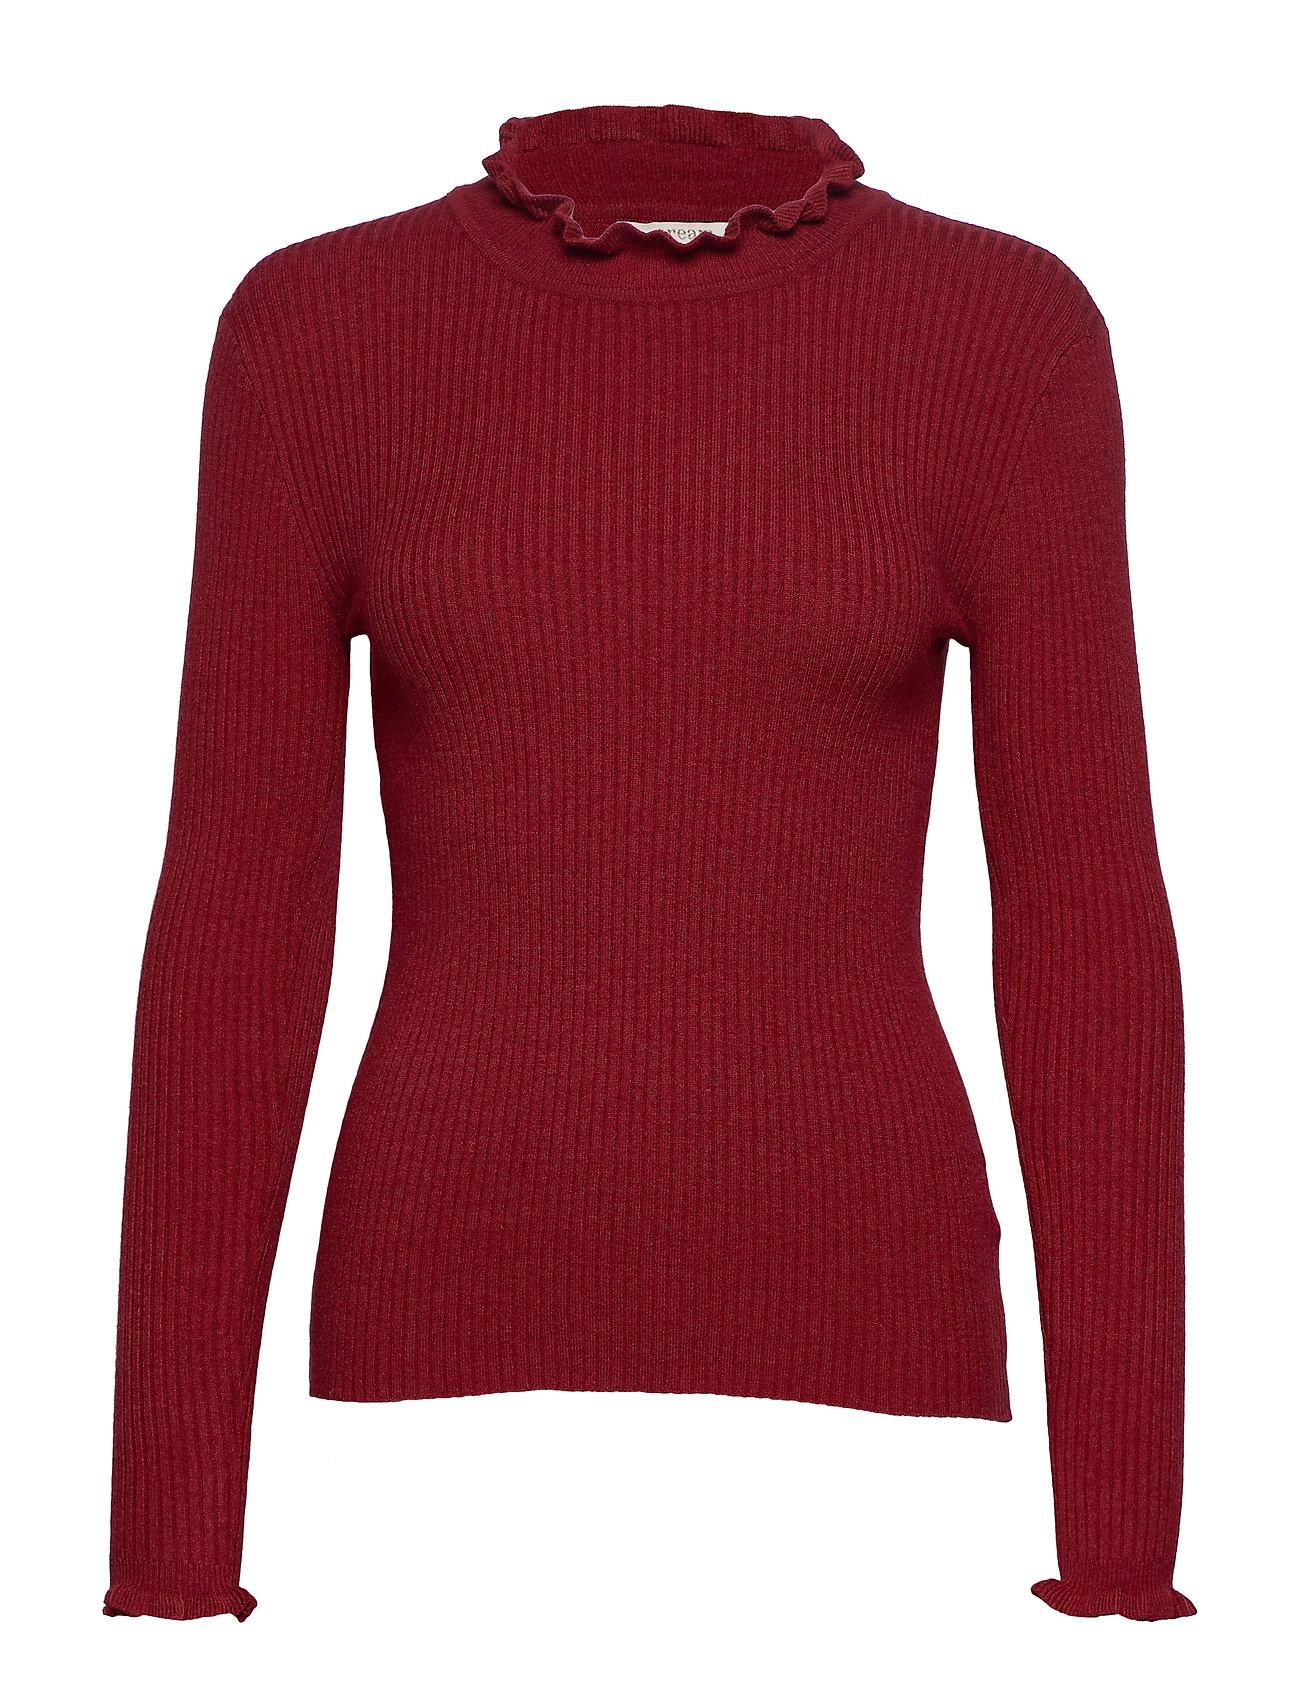 Cream Helena Pullover - MERLOT RED